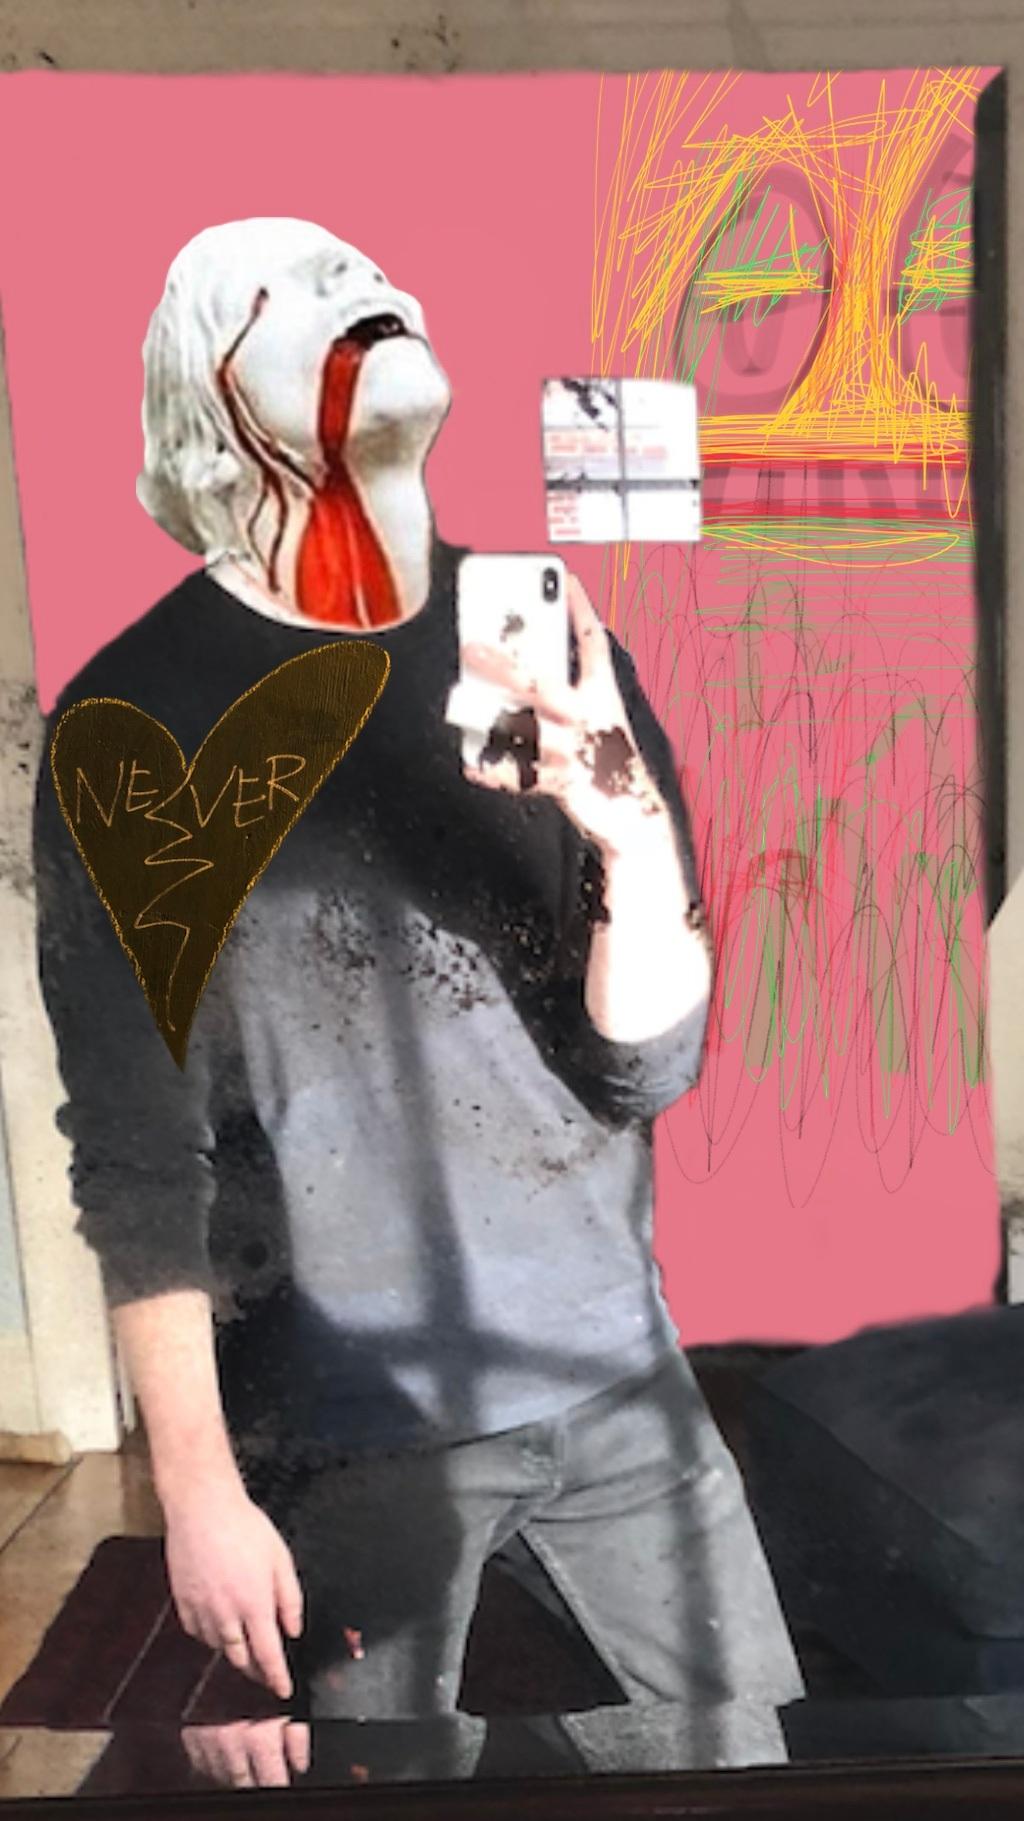 B-DAY selfie, MSPaint, & statue digital collage. 2019 9:16